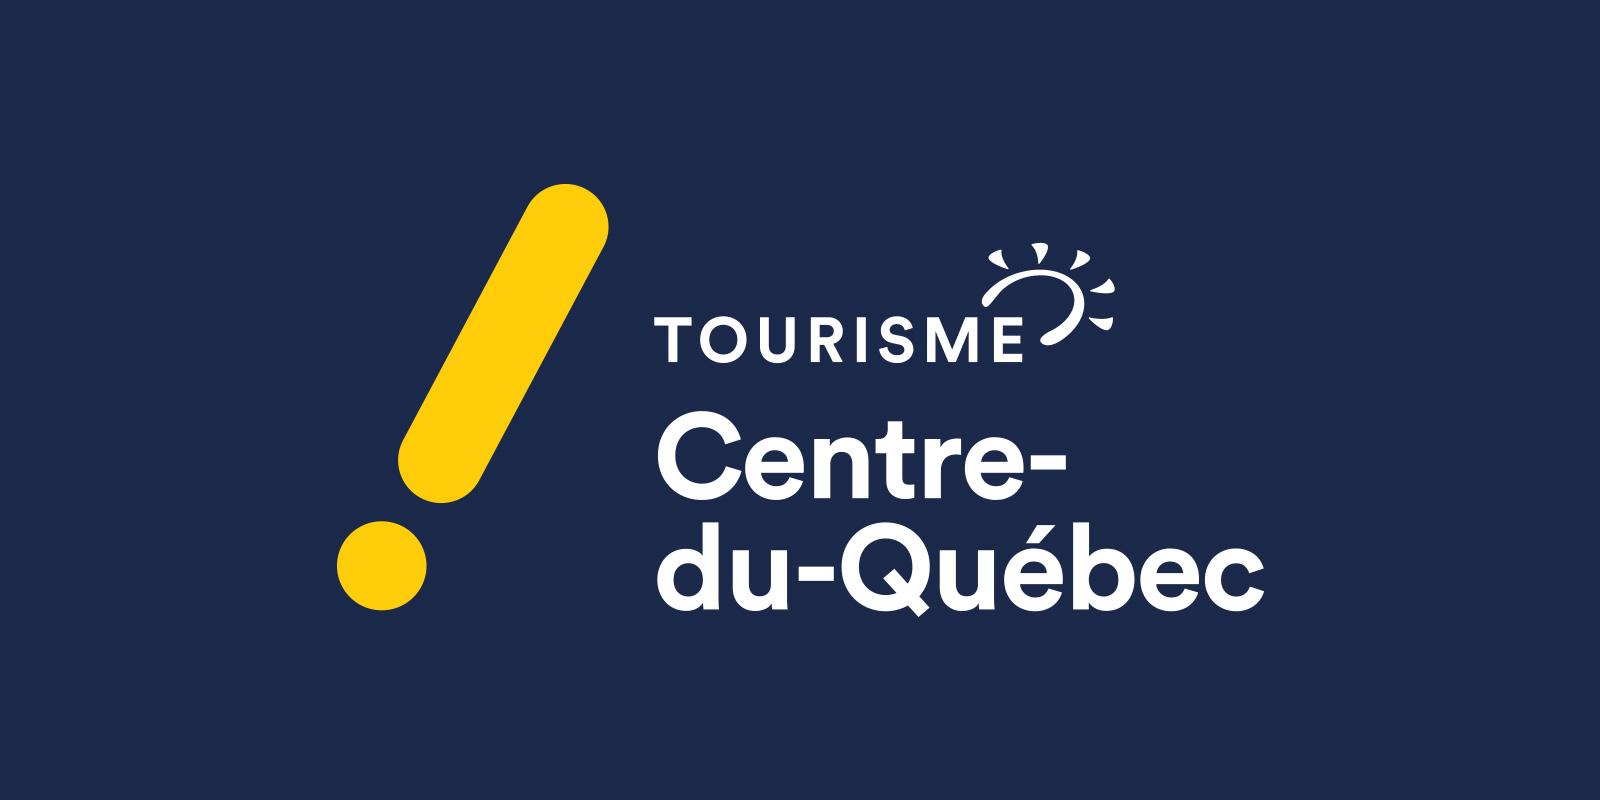 Tourisme Centre-du-Québec